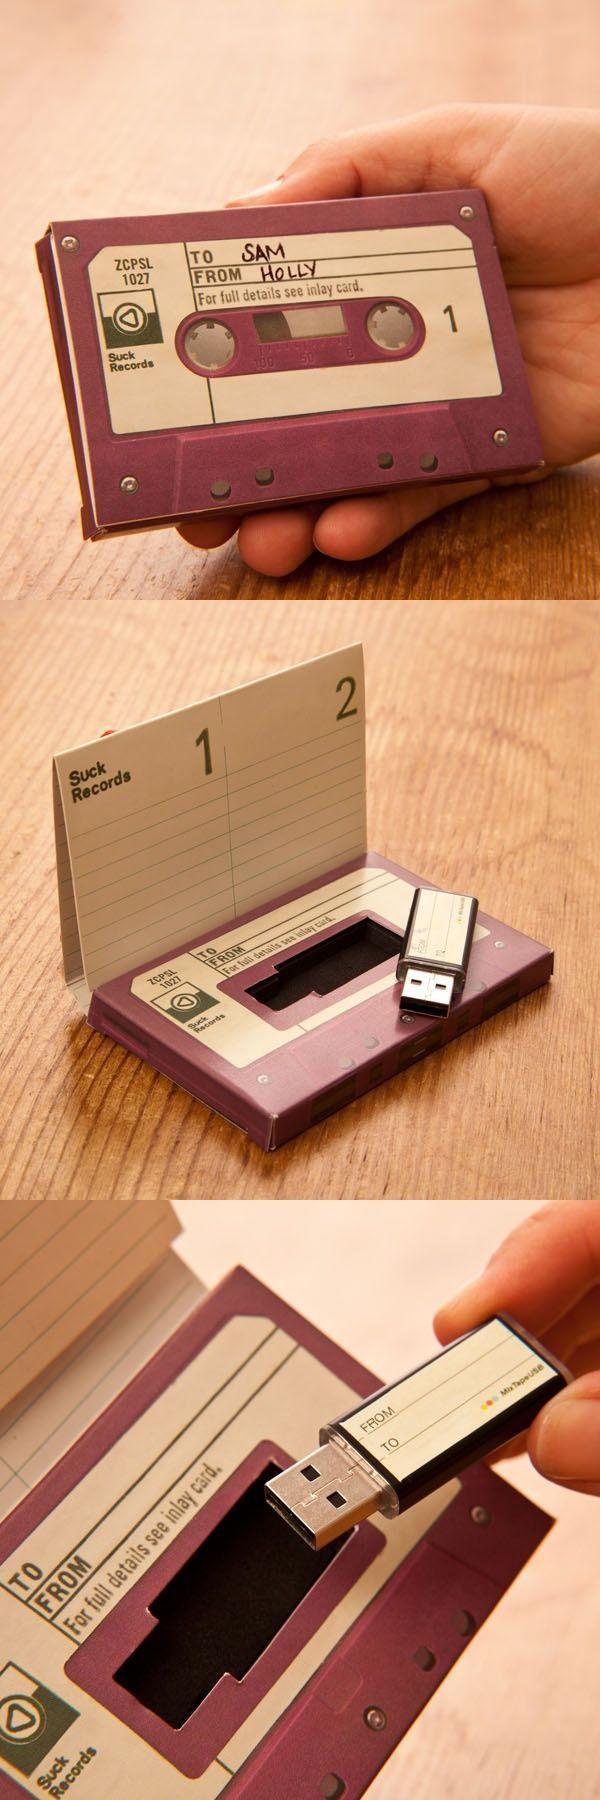 Casete simulado con memoria USB Casete simulado con memoria USB